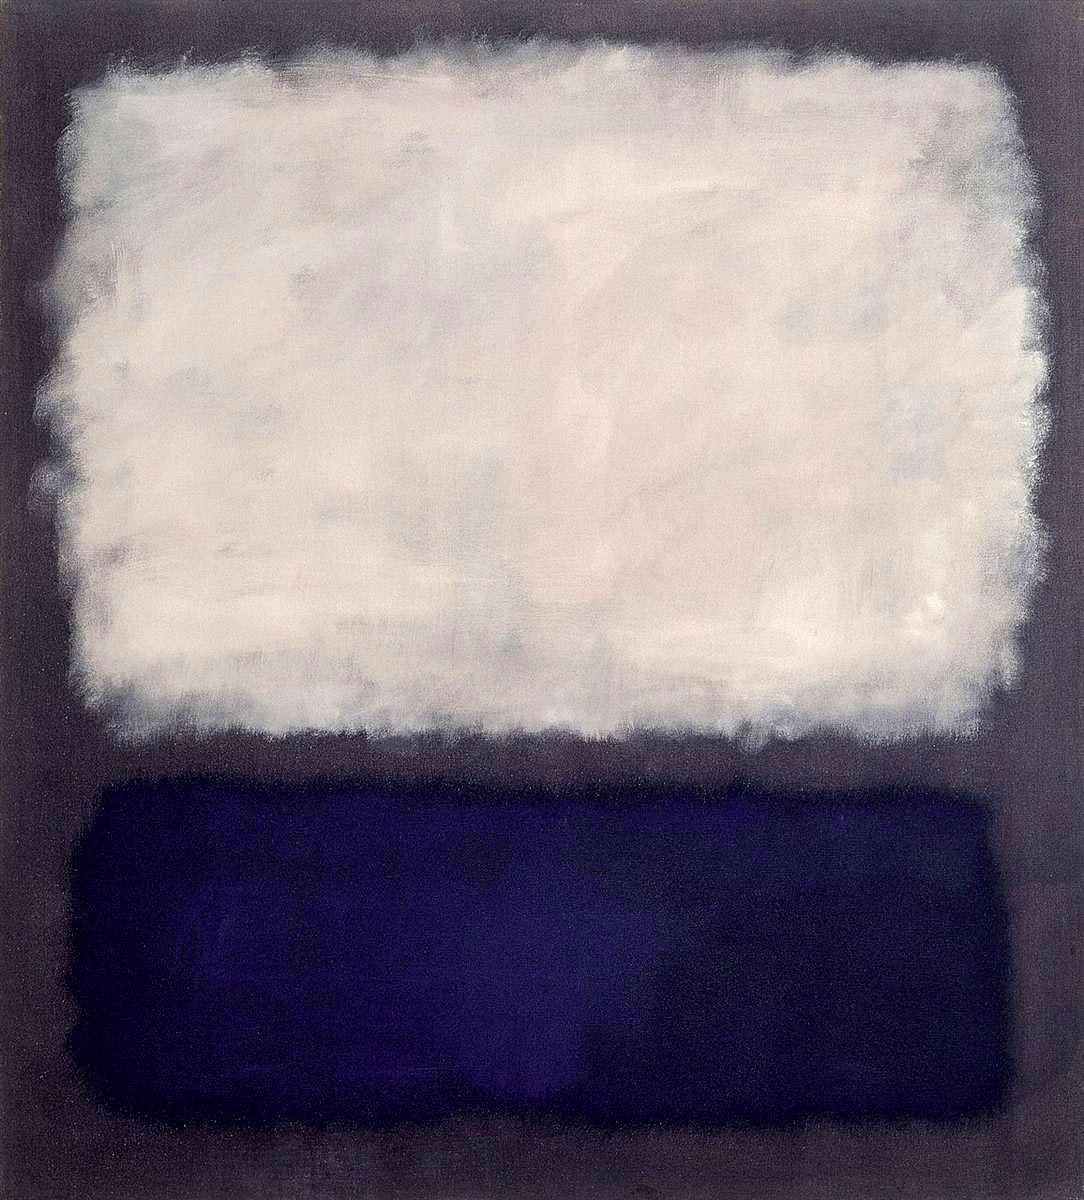 художник Марк РОТКО (1903-1970) / «Синий и серый»